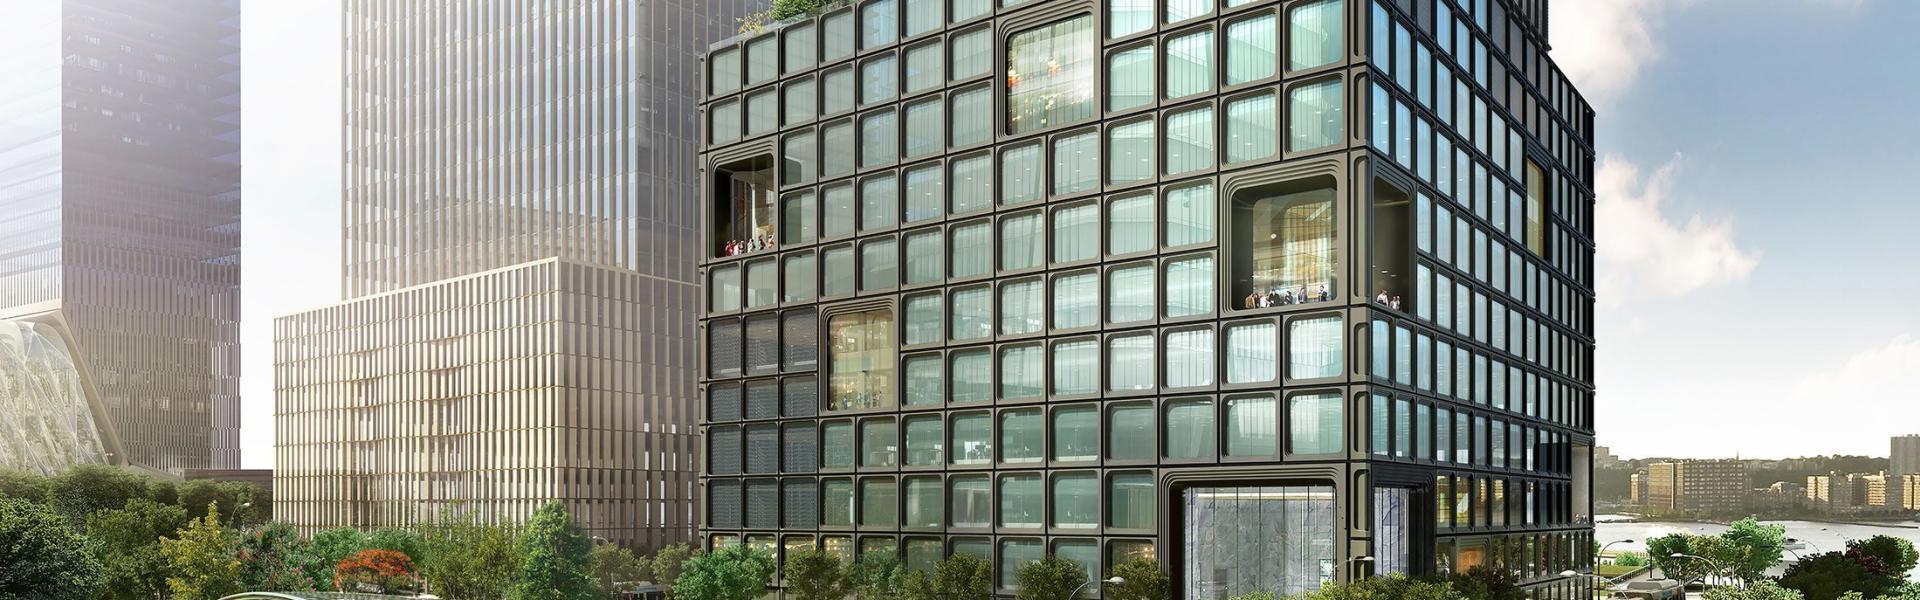 Hudson-Yards-Manhattan-NYC-55-Hudson-Yards-Podium-Courtesy-Related-Oxford-Mitsui-1